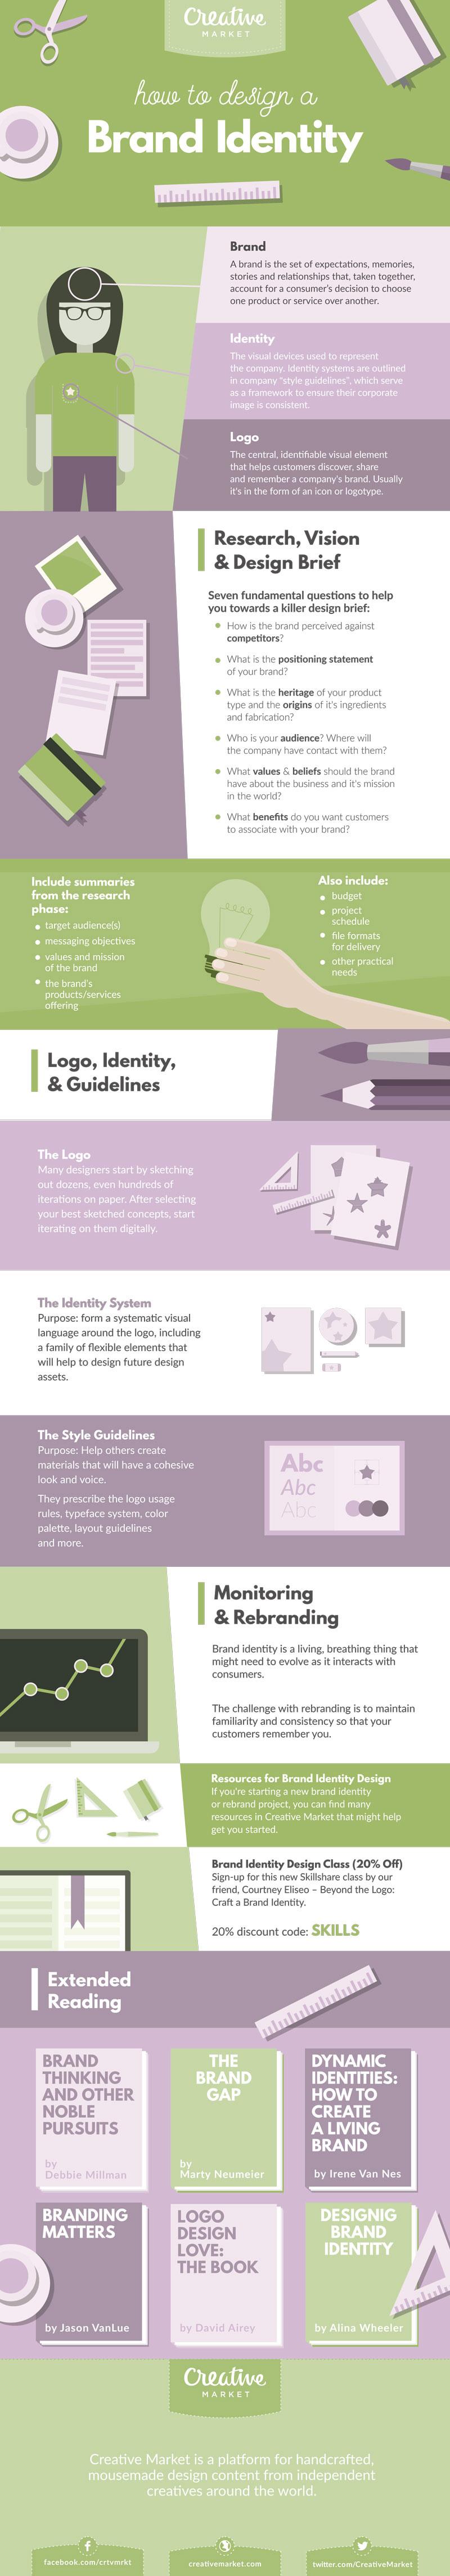 brand-identity-design-basics-infographic-full-size